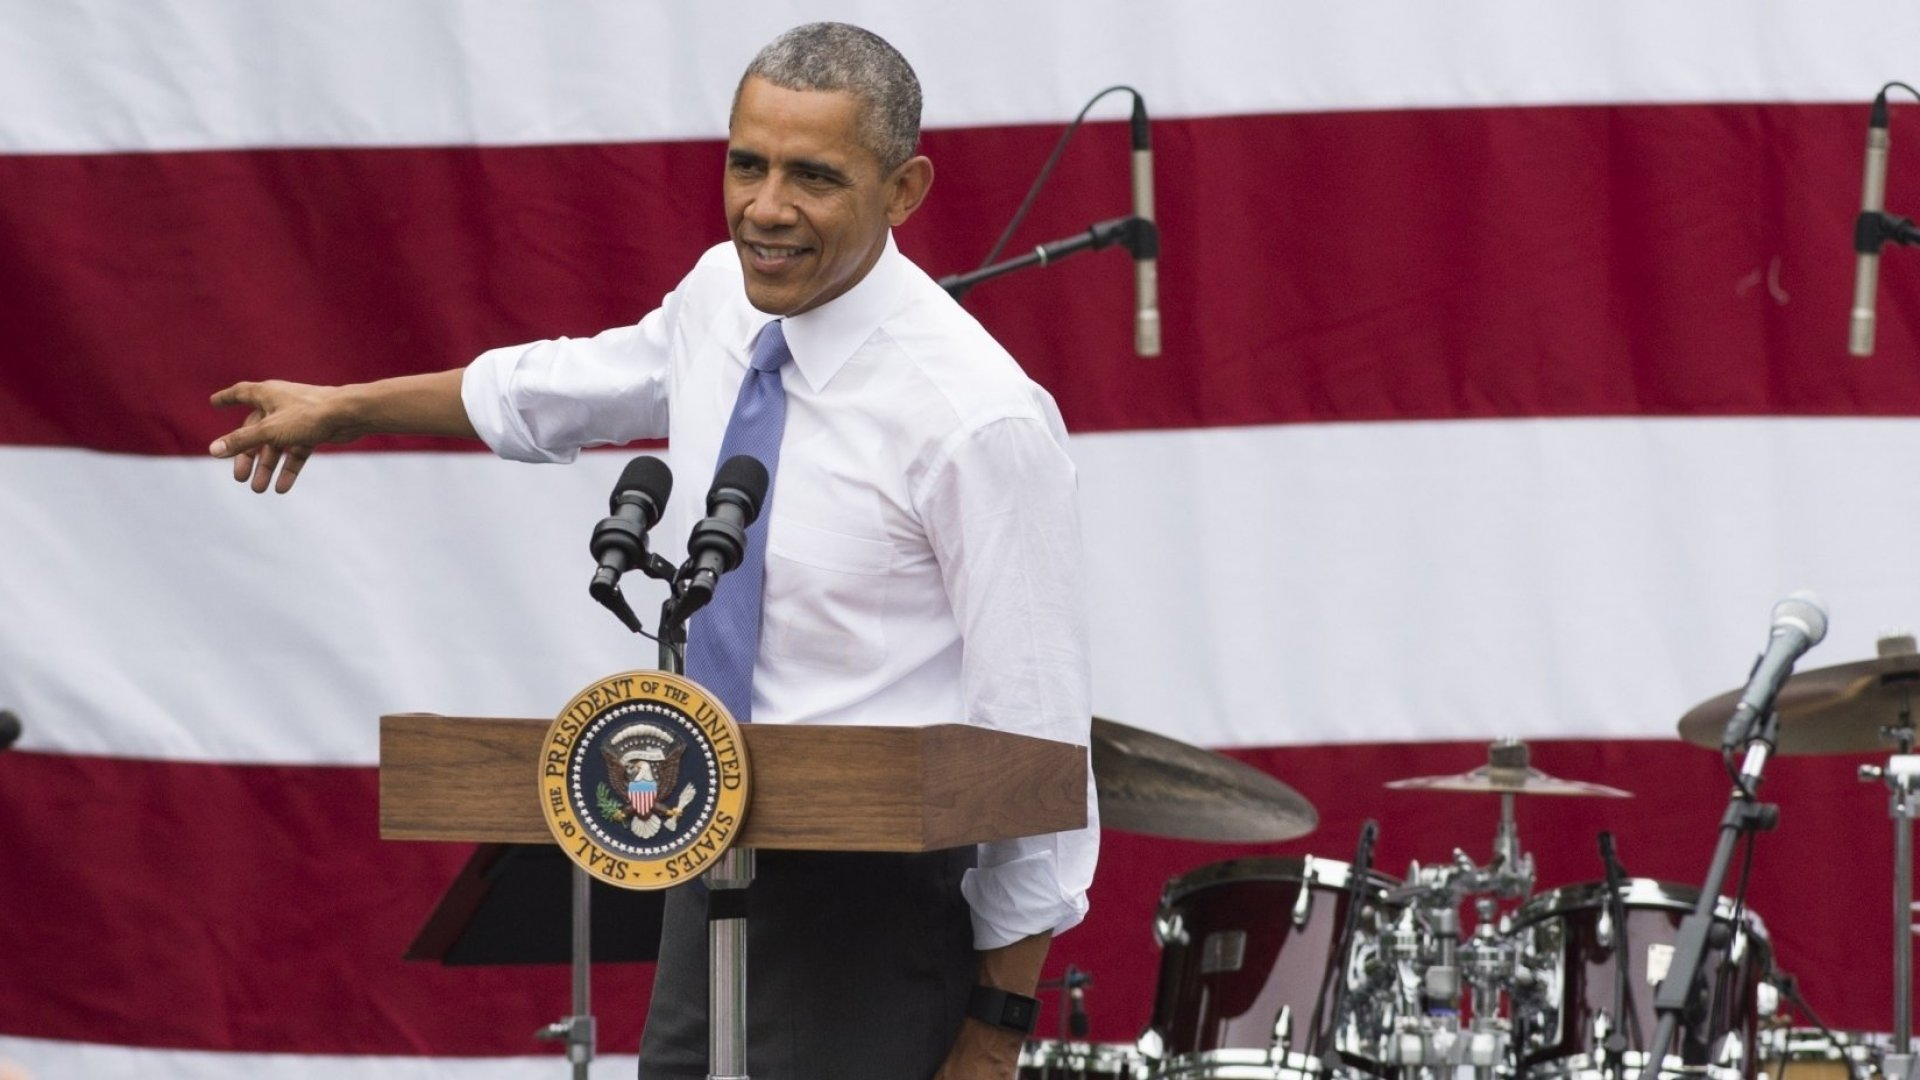 House Revives Obama's Trade Agenda, but Senate Vote Awaits